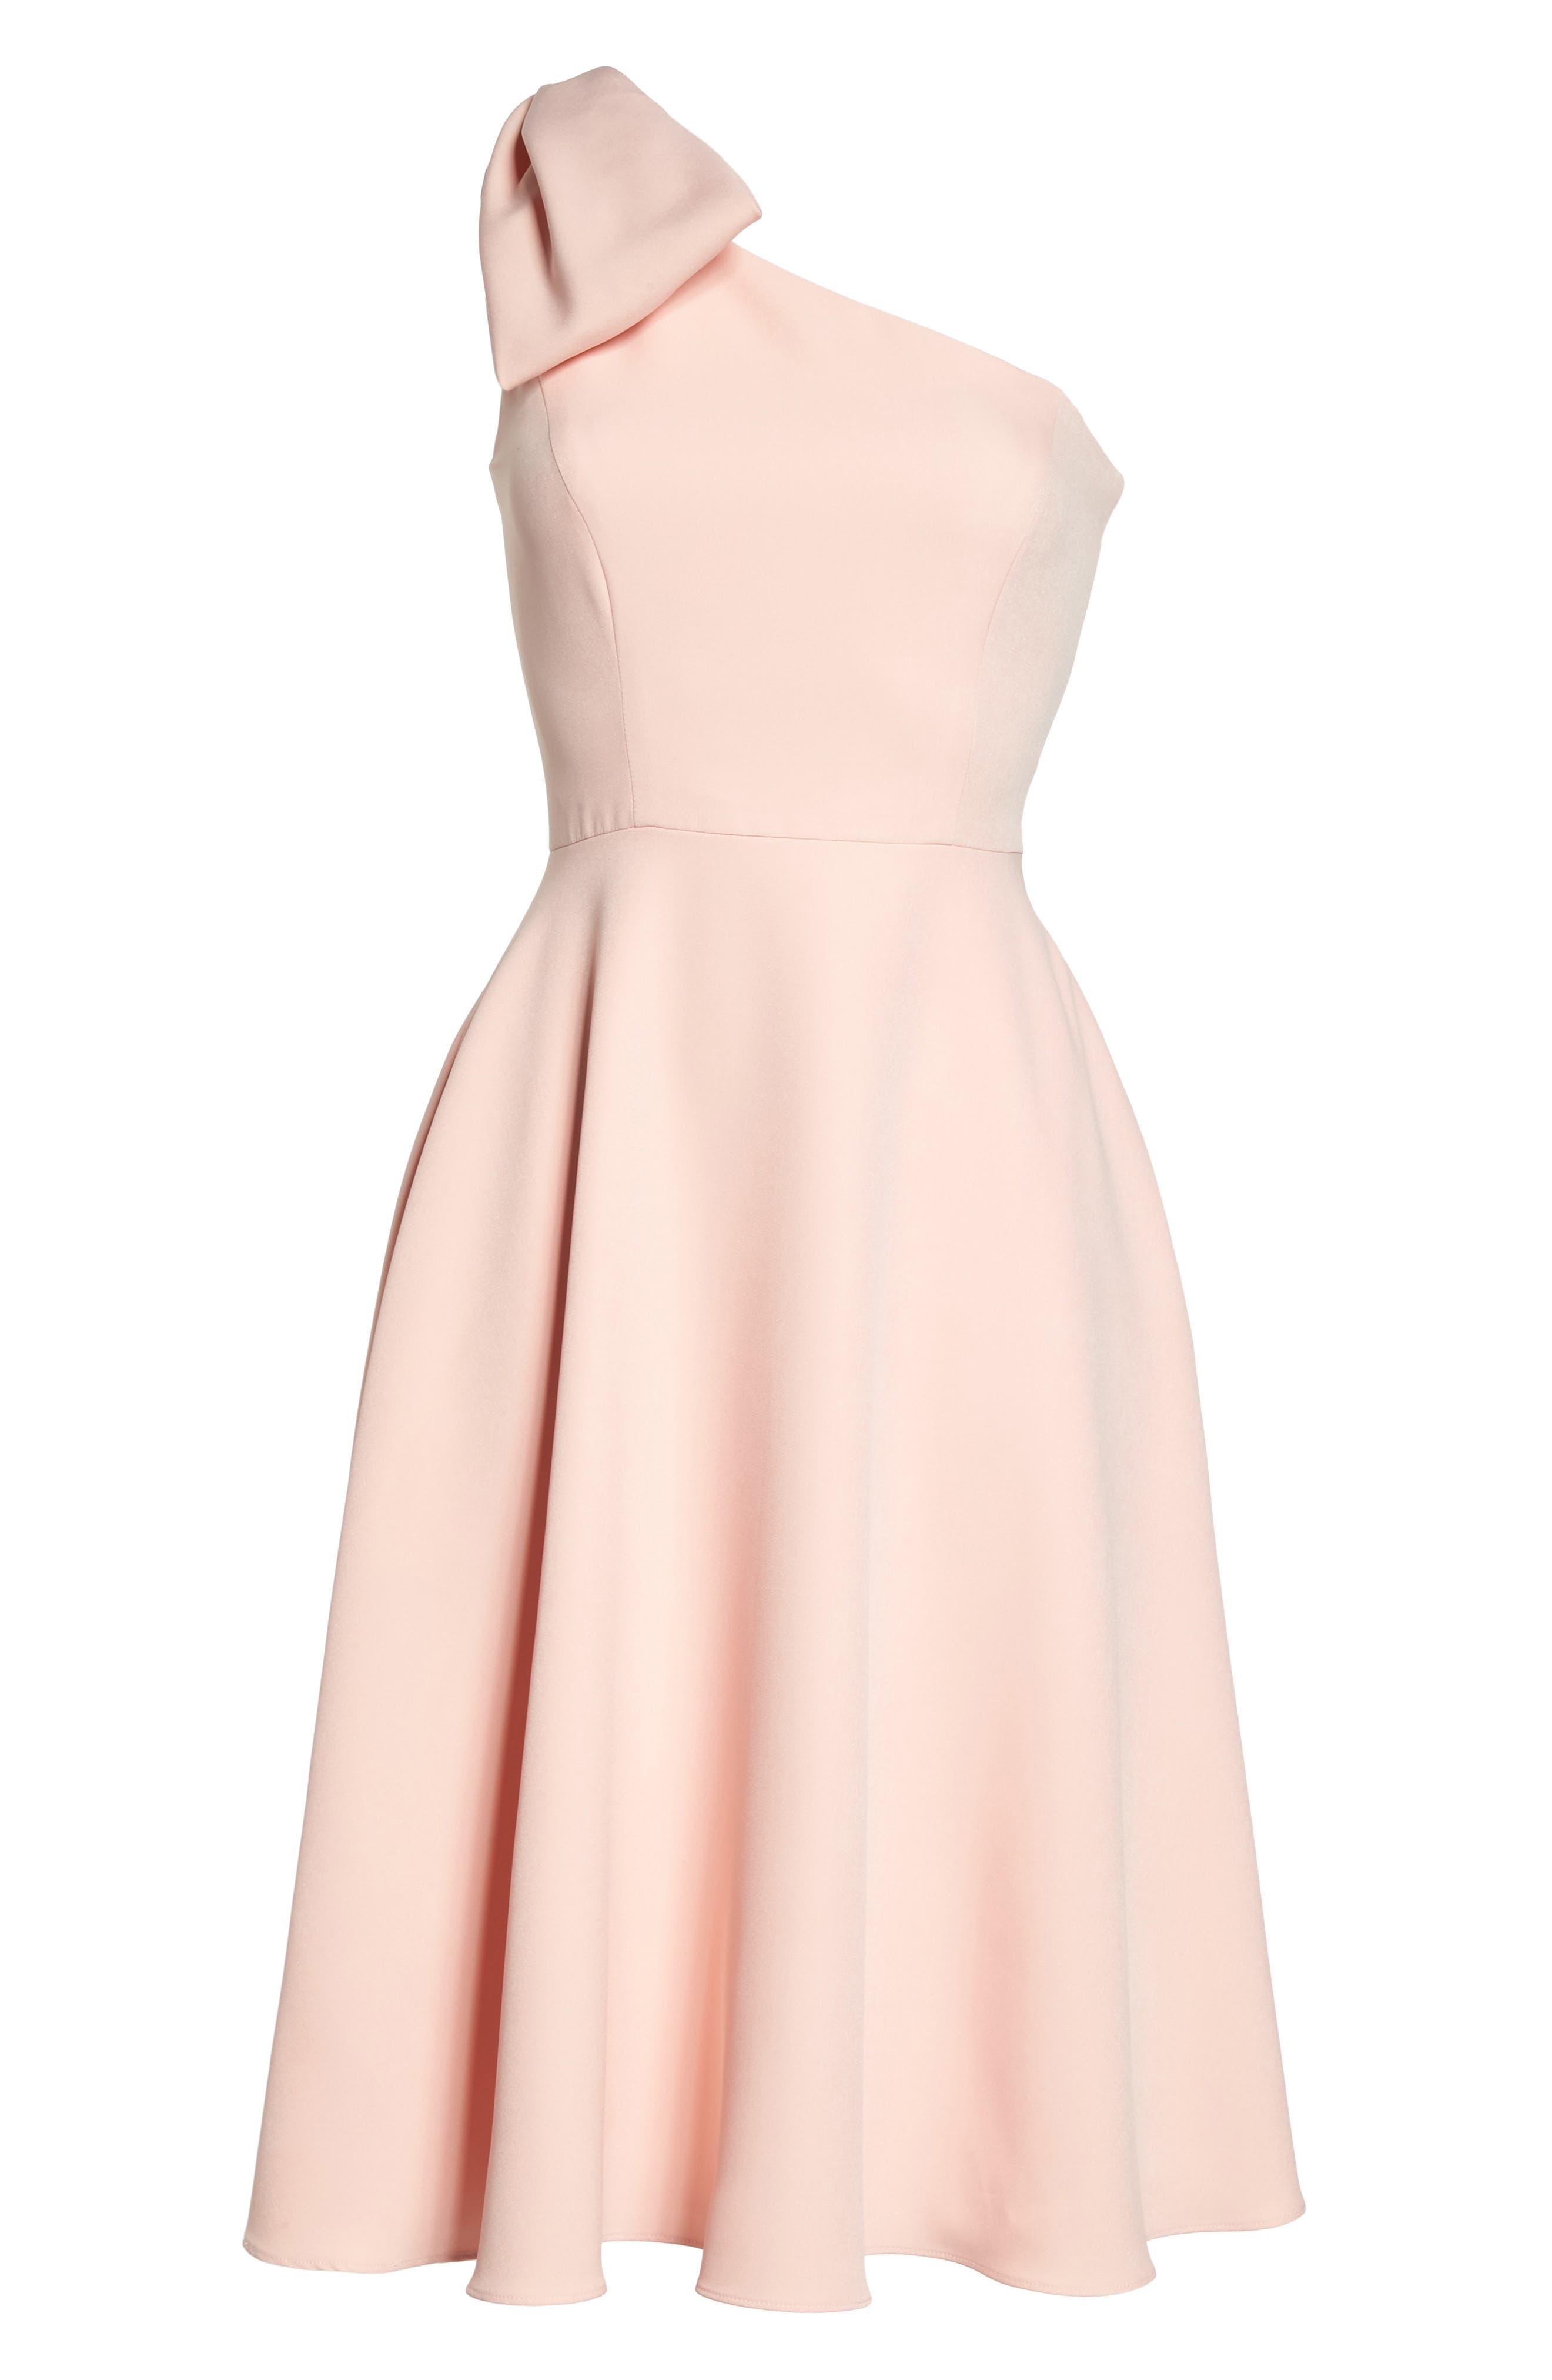 Yvonne Dream Crepe One-Shoulder Dress,                             Alternate thumbnail 13, color,